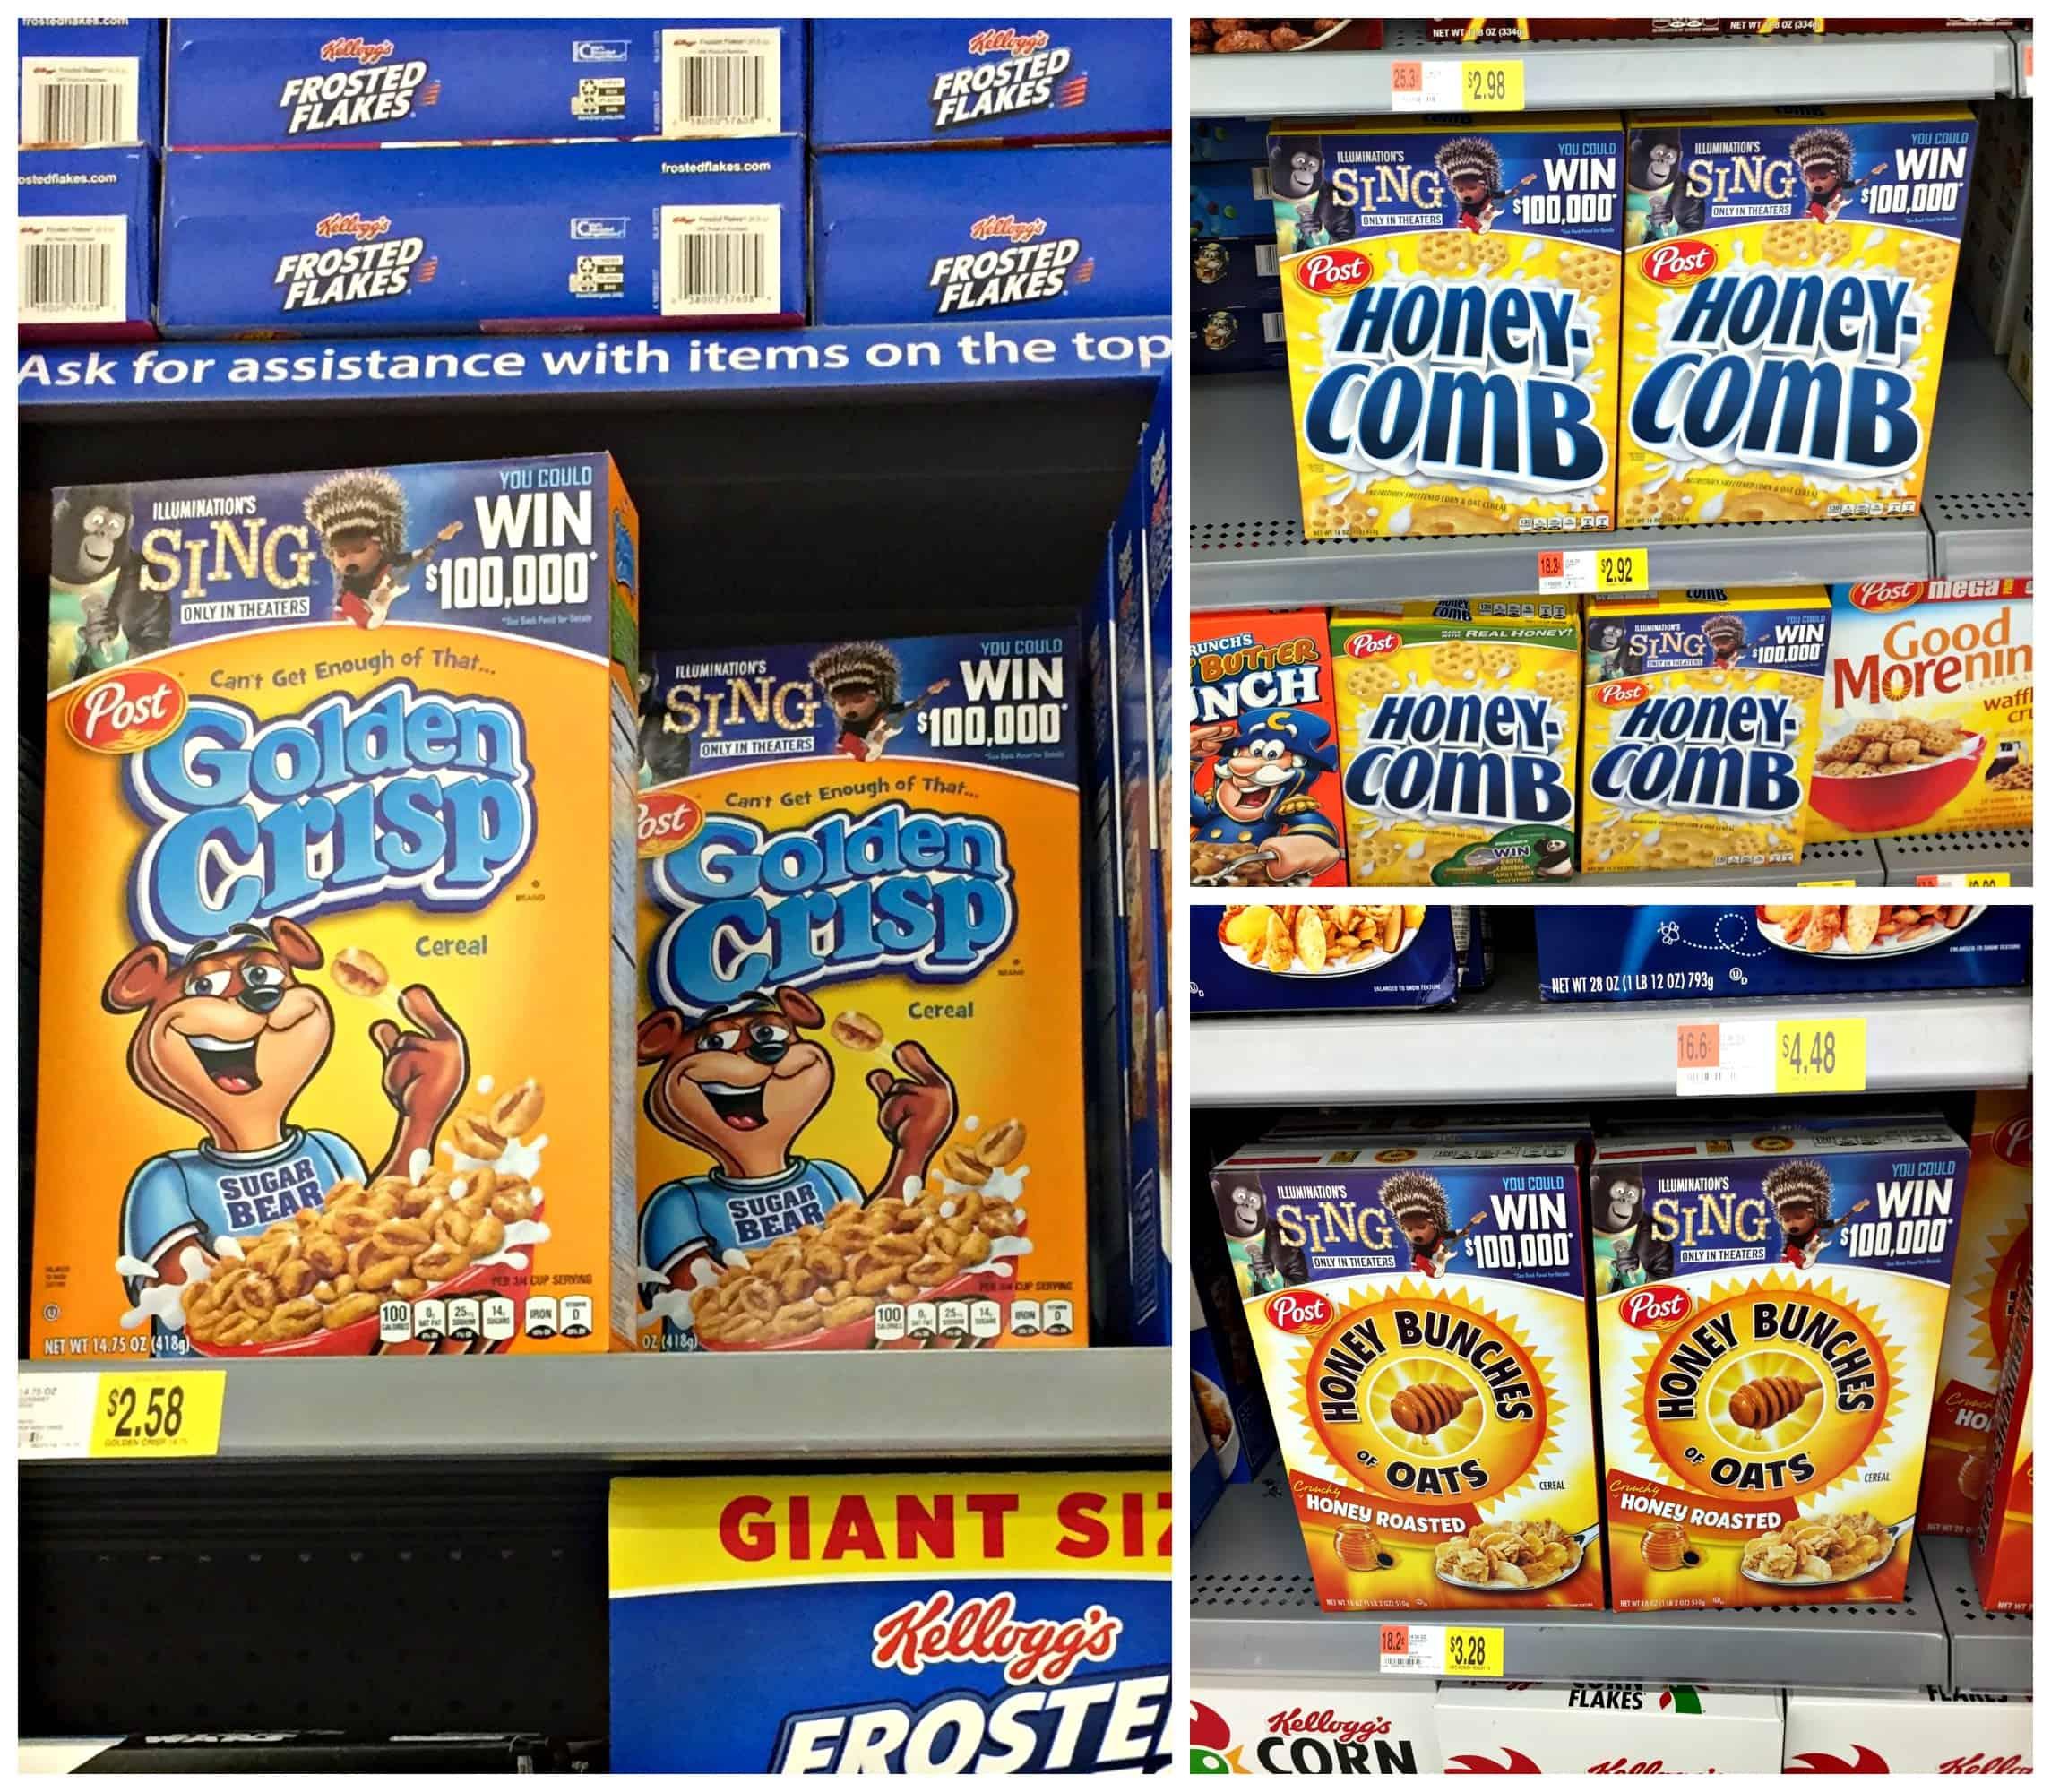 Easy Golden Crisps Cereal Snack Bars